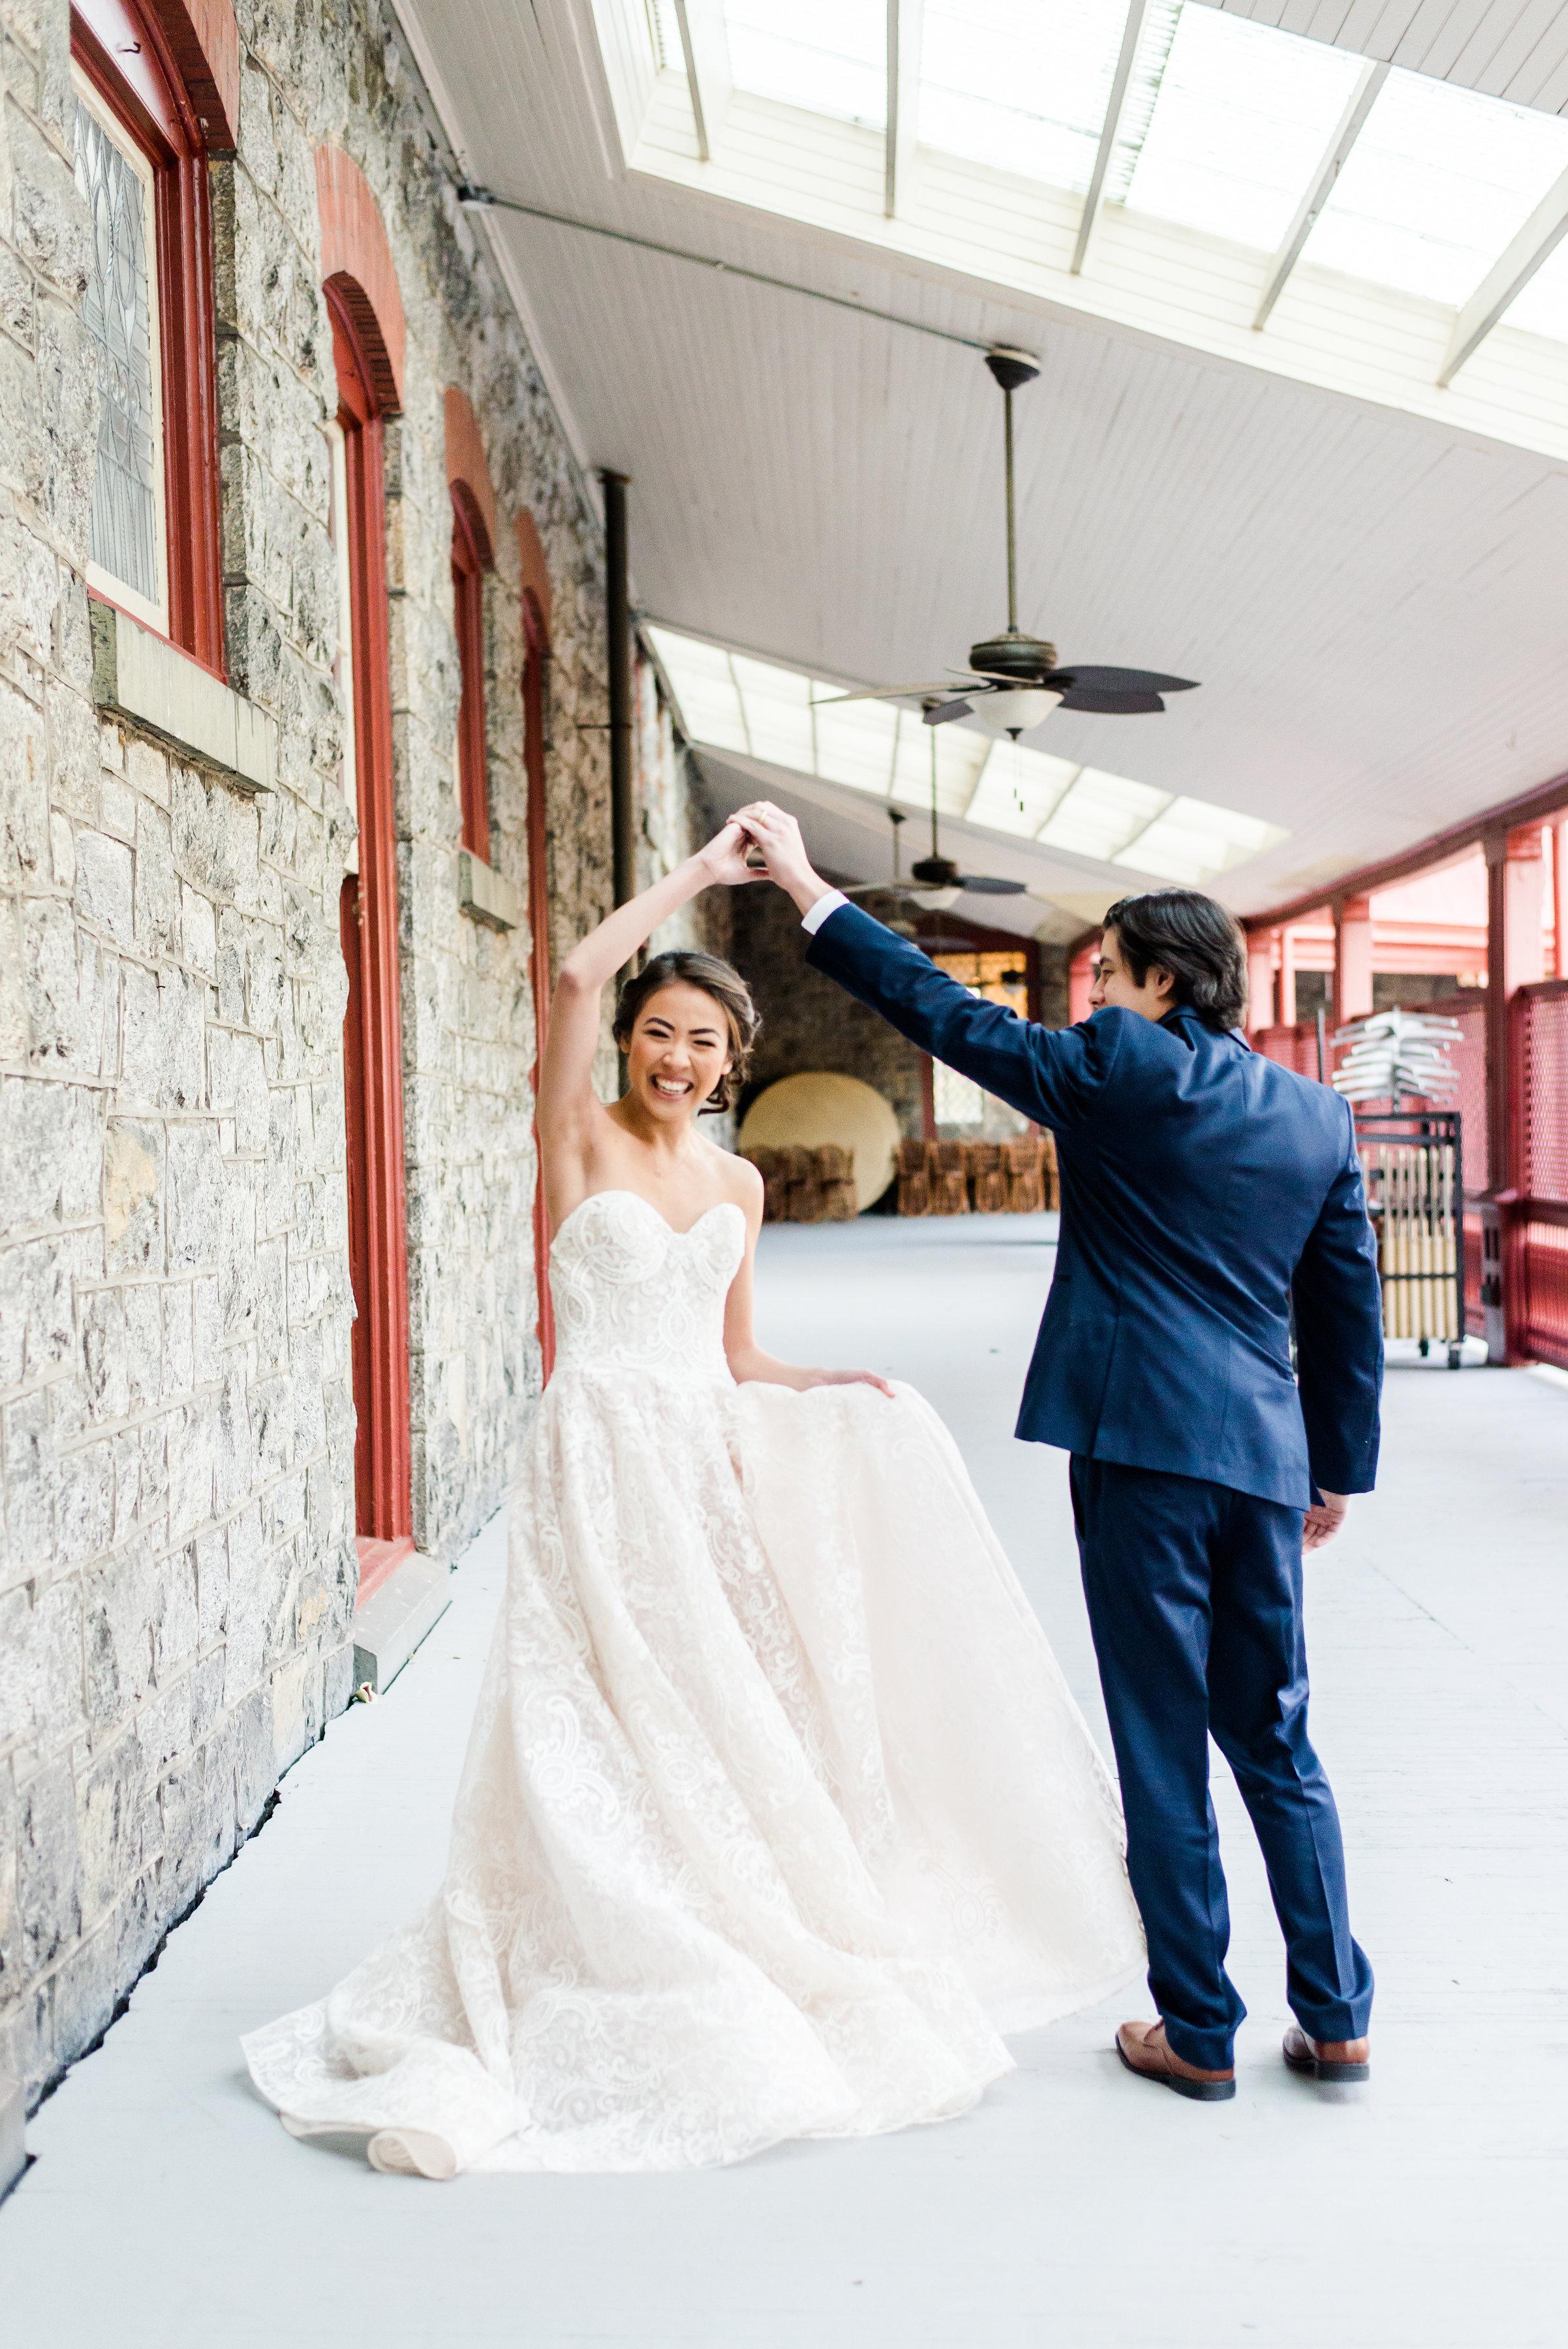 Baldwin-School-Wedding-Photographer-Event-Venue-Pennsylvania-Mainline-Andrea-Krout-Photography-584.jpg